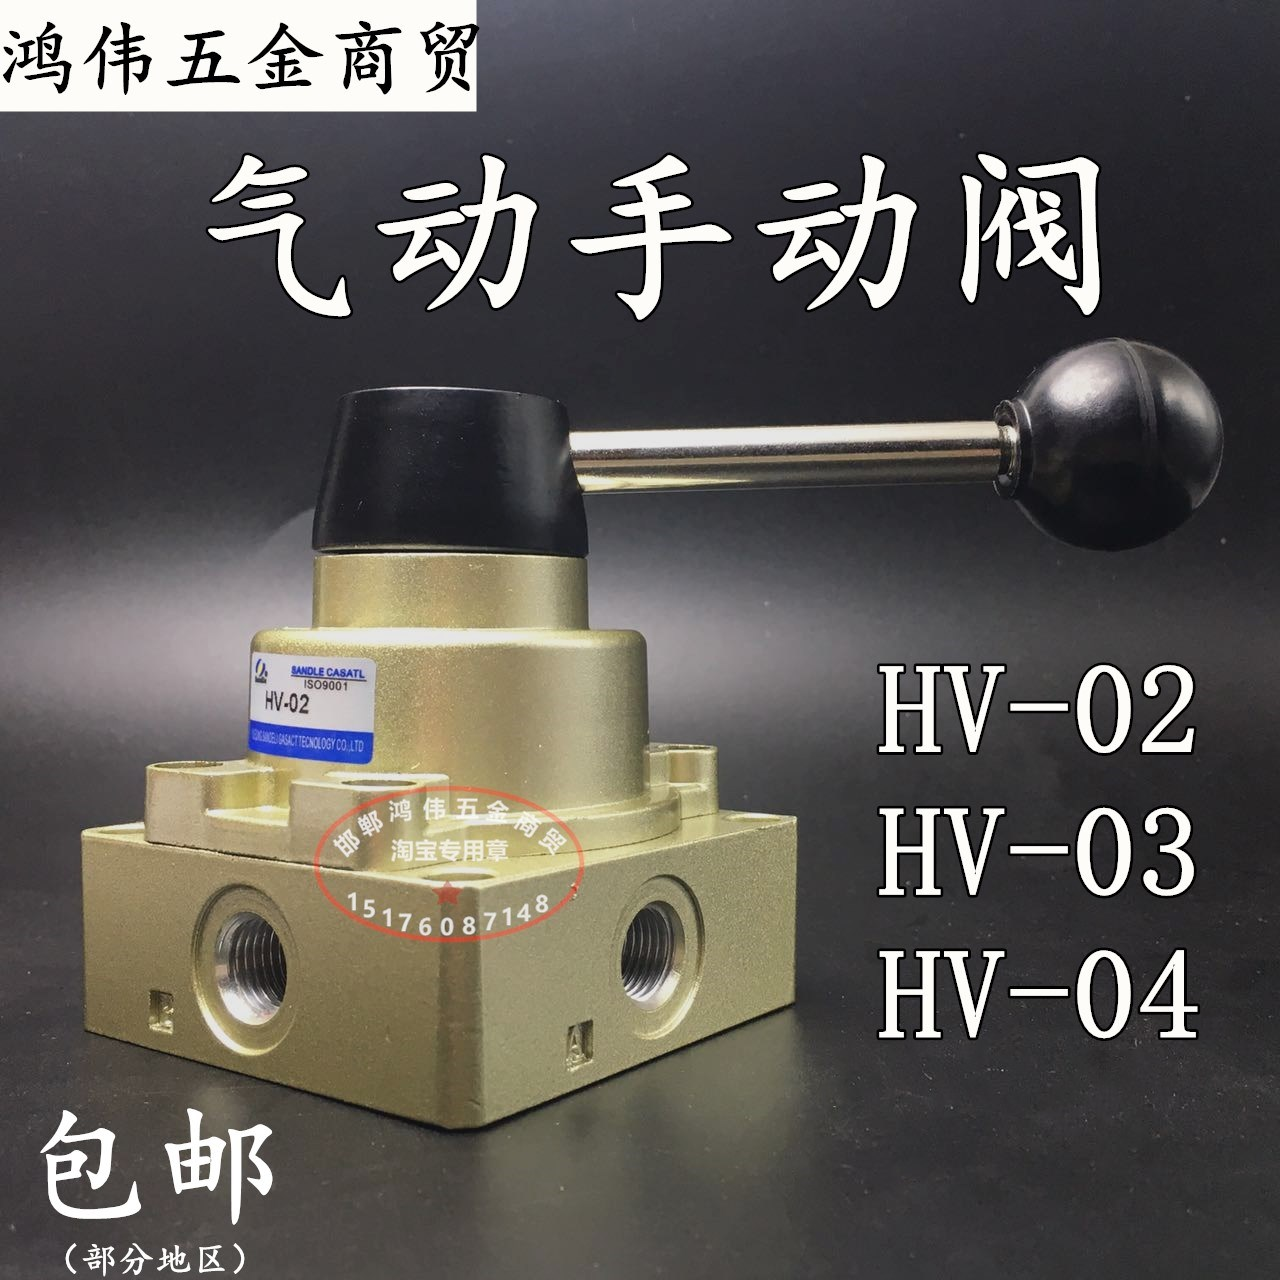 Hot three bit four way manual valve, manual switch valve, manual reversing pneumatic valve hv-020304 man control